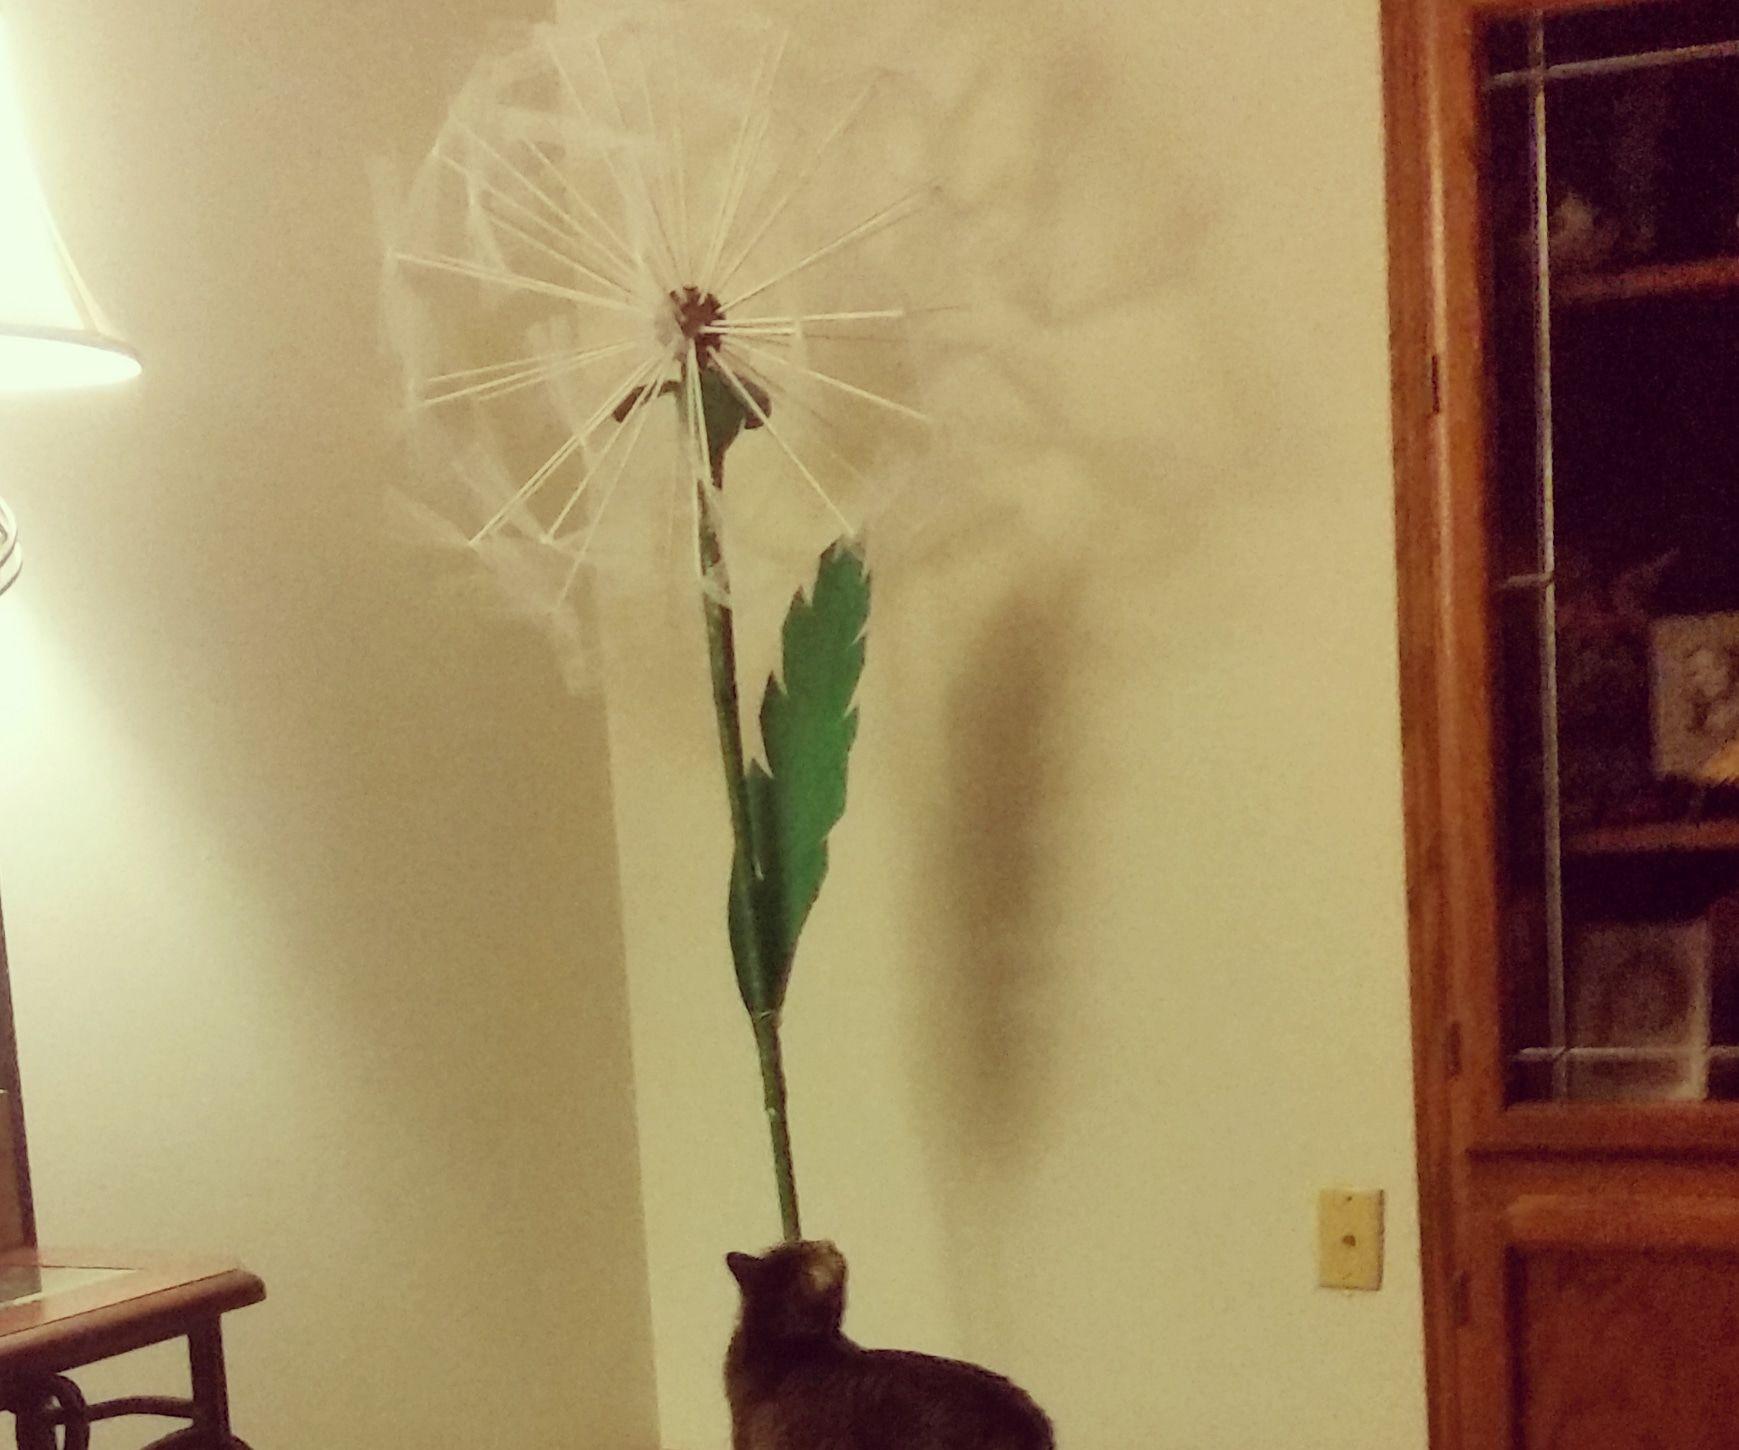 Larger Than Life Dandelion